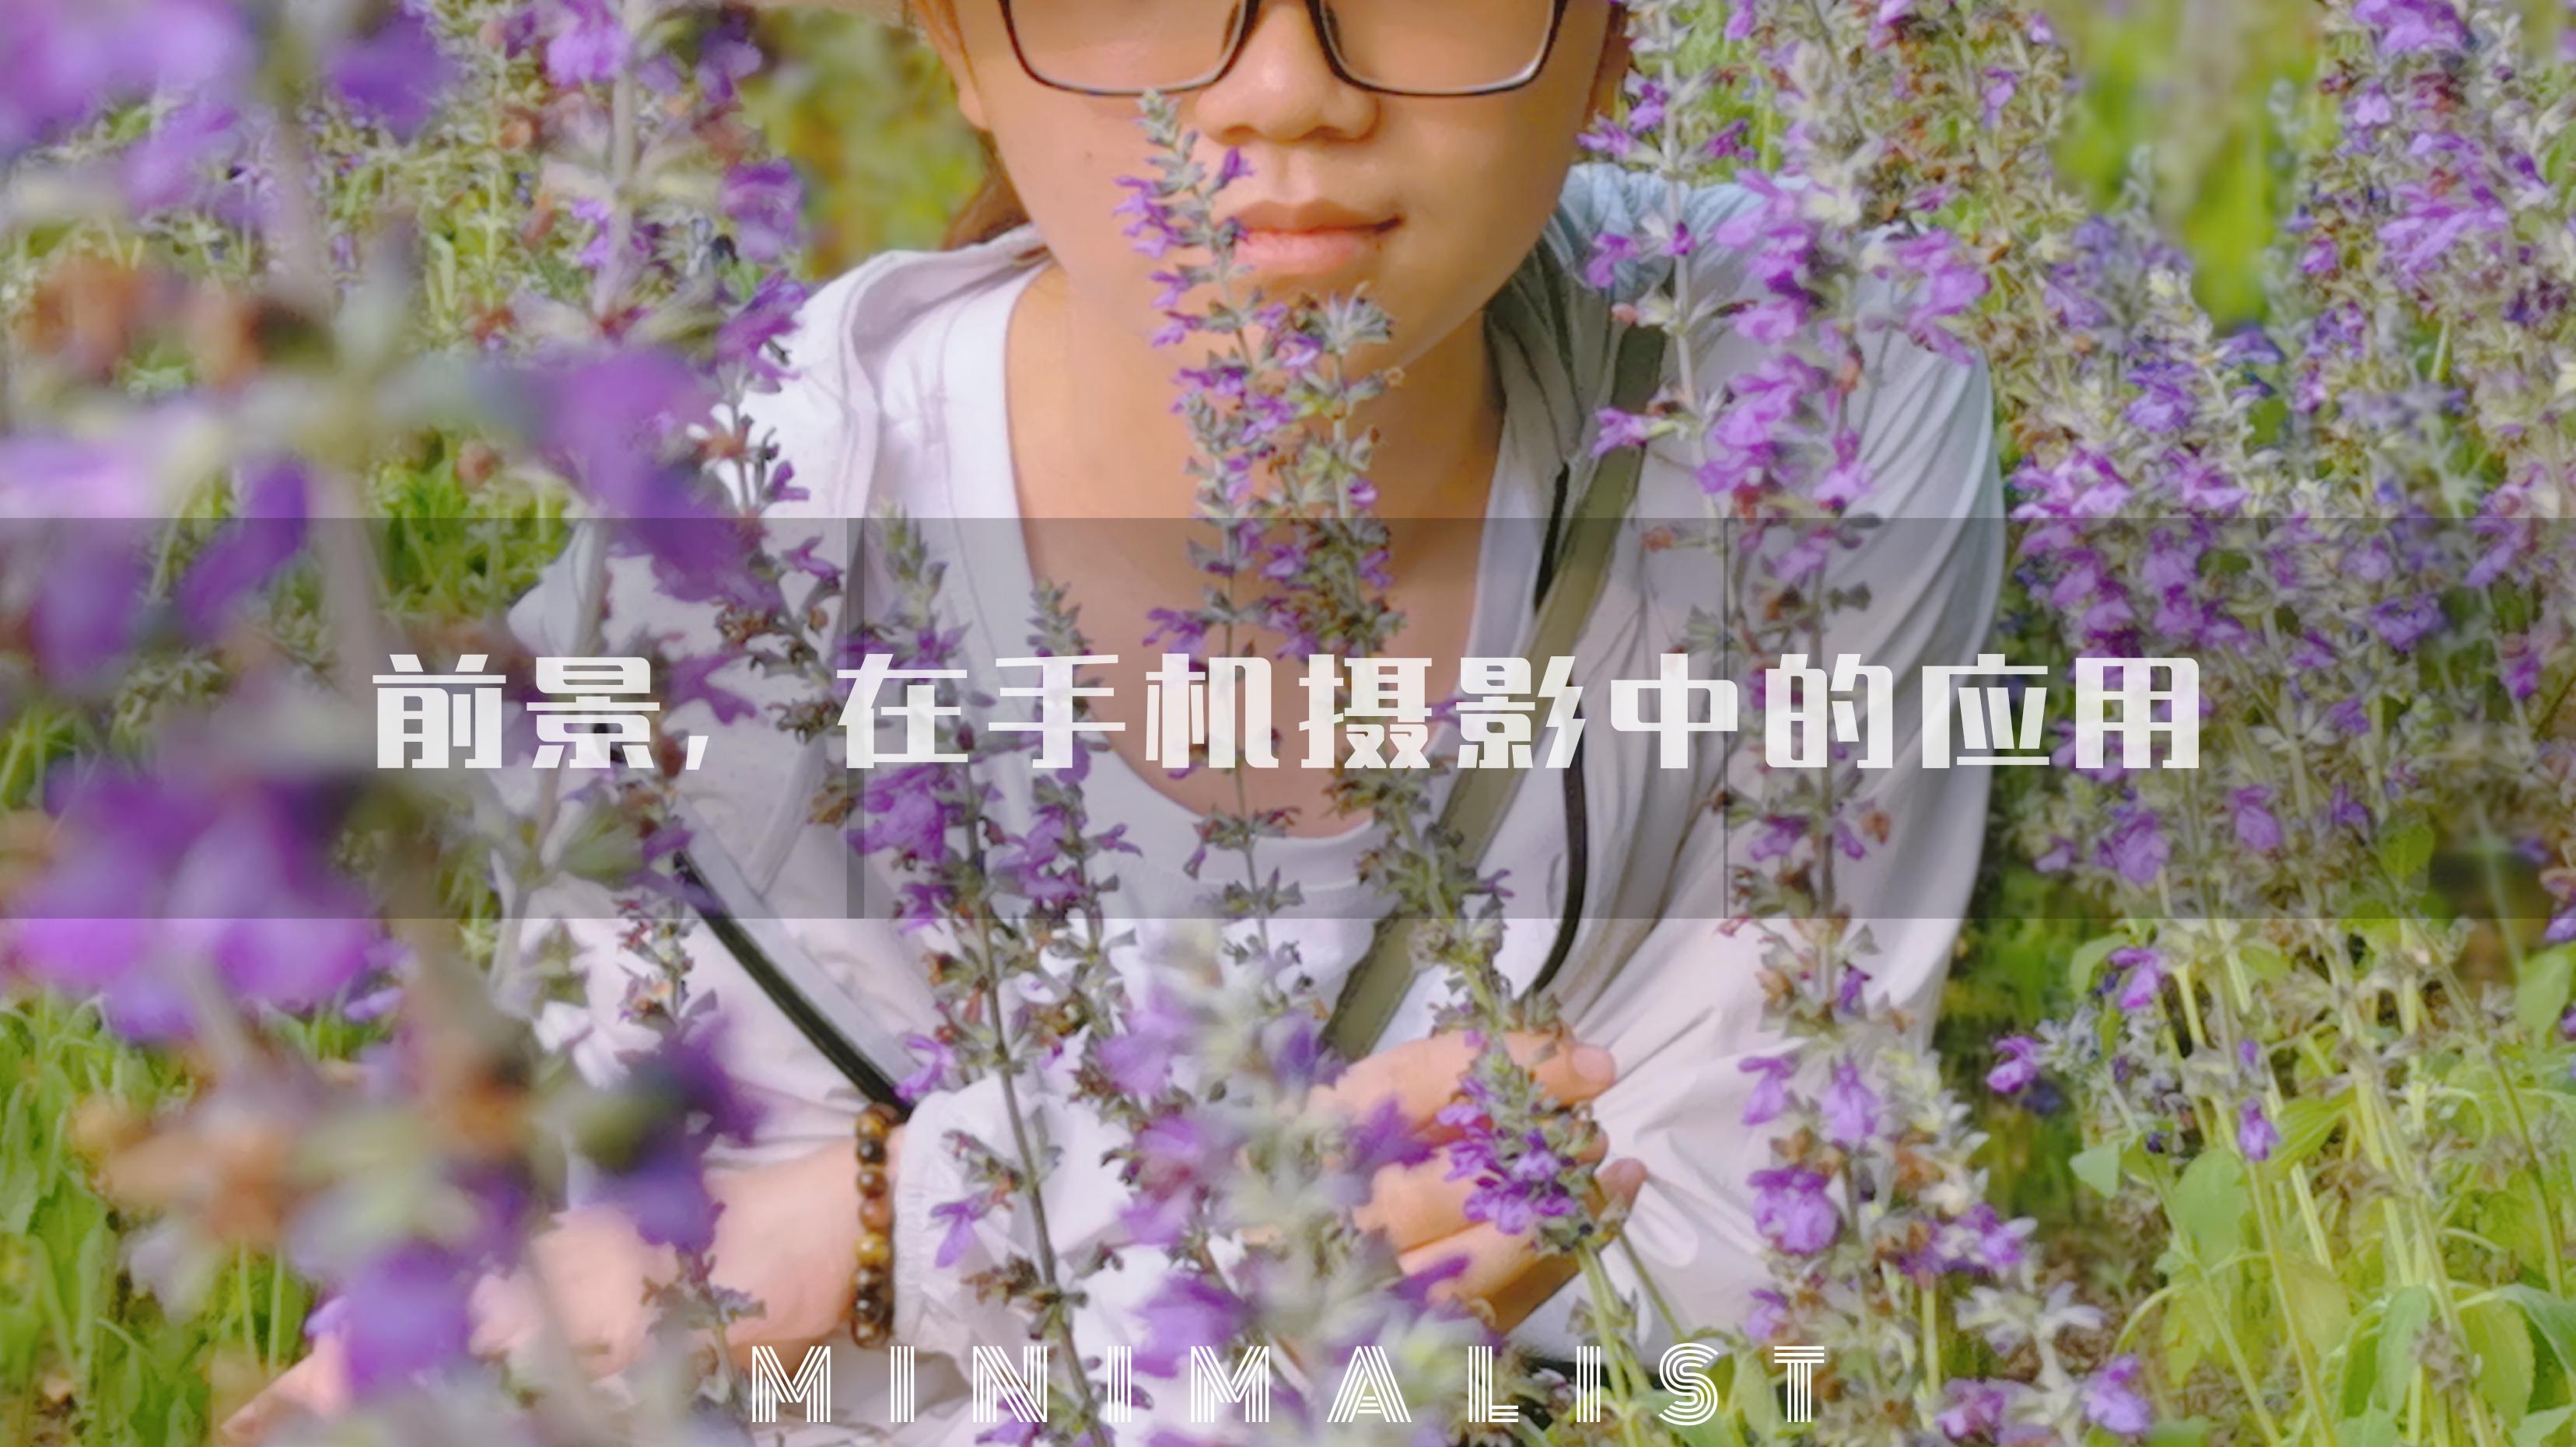 IMG_20190914_162804_mix01_mix02.jpg